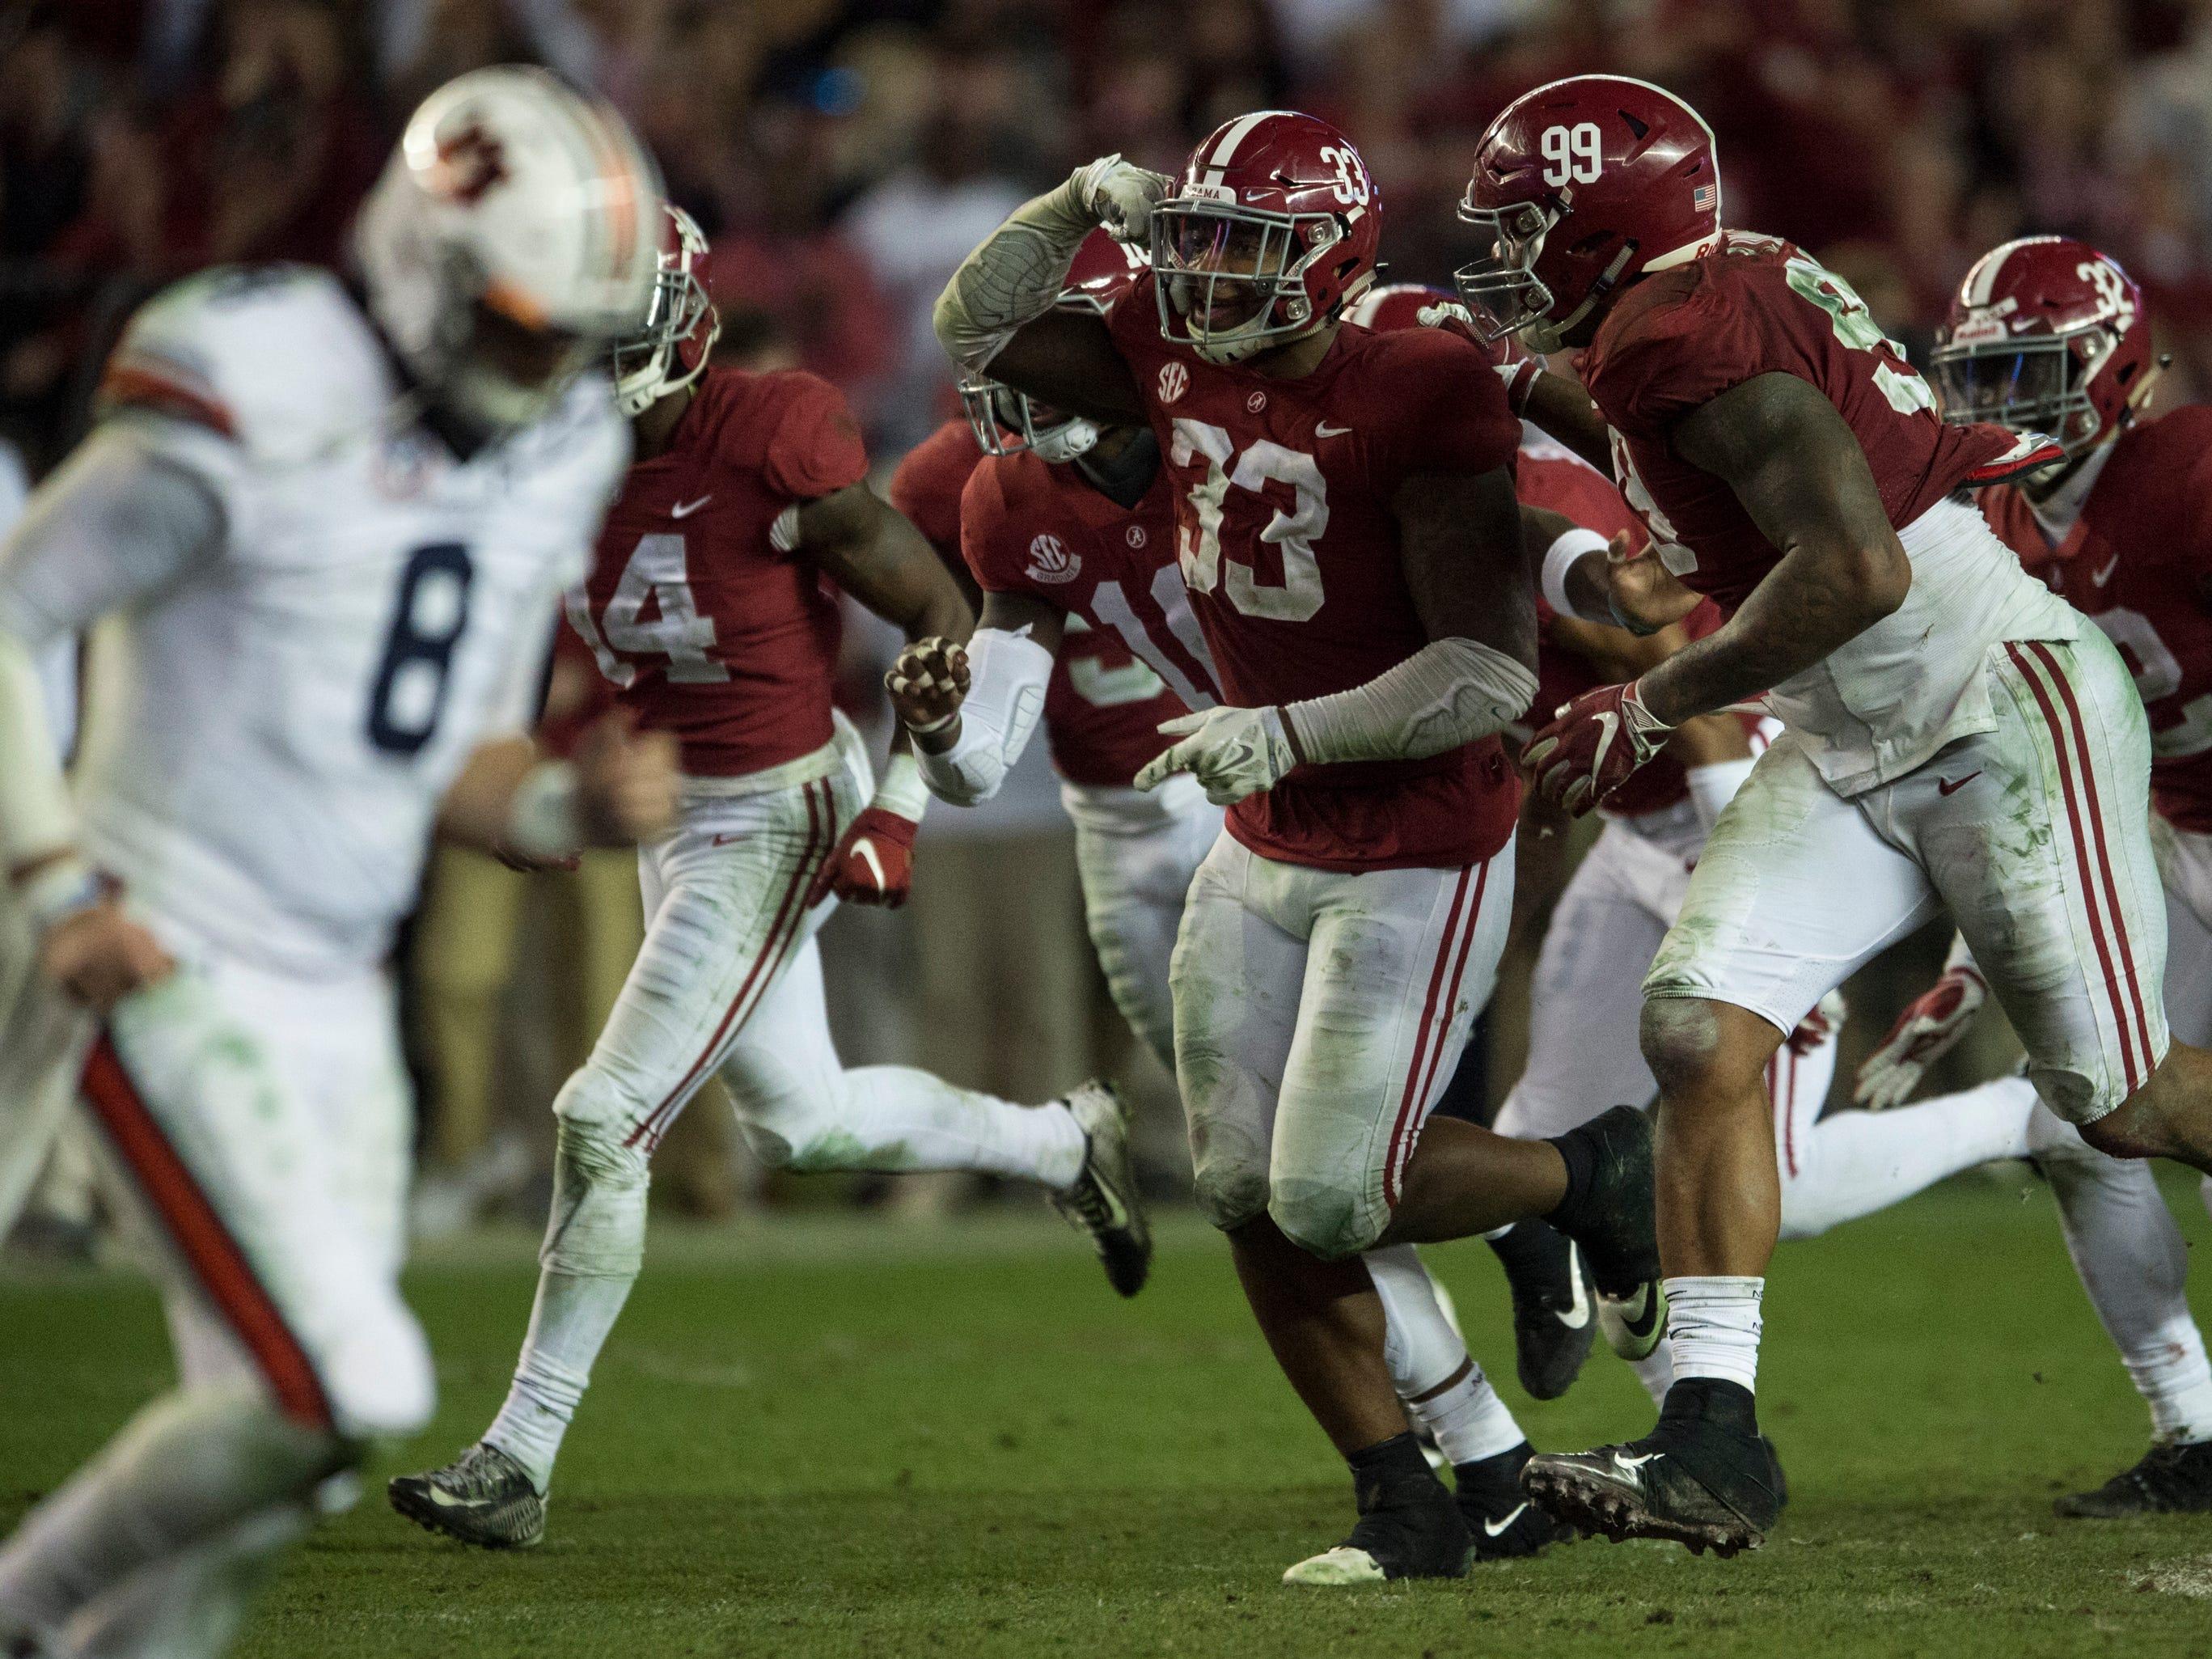 Alabama linebacker Anfernee Jennings (33) celebrates after intercepting the ball as Auburn quarterback Jarrett Stidham (8) runs off the field during the Iron Bowl at Bryant-Denny Stadium in Tuscaloosa, Ala., on Saturday, Nov. 24, 2018. Alabama defeated Auburn 52-21.